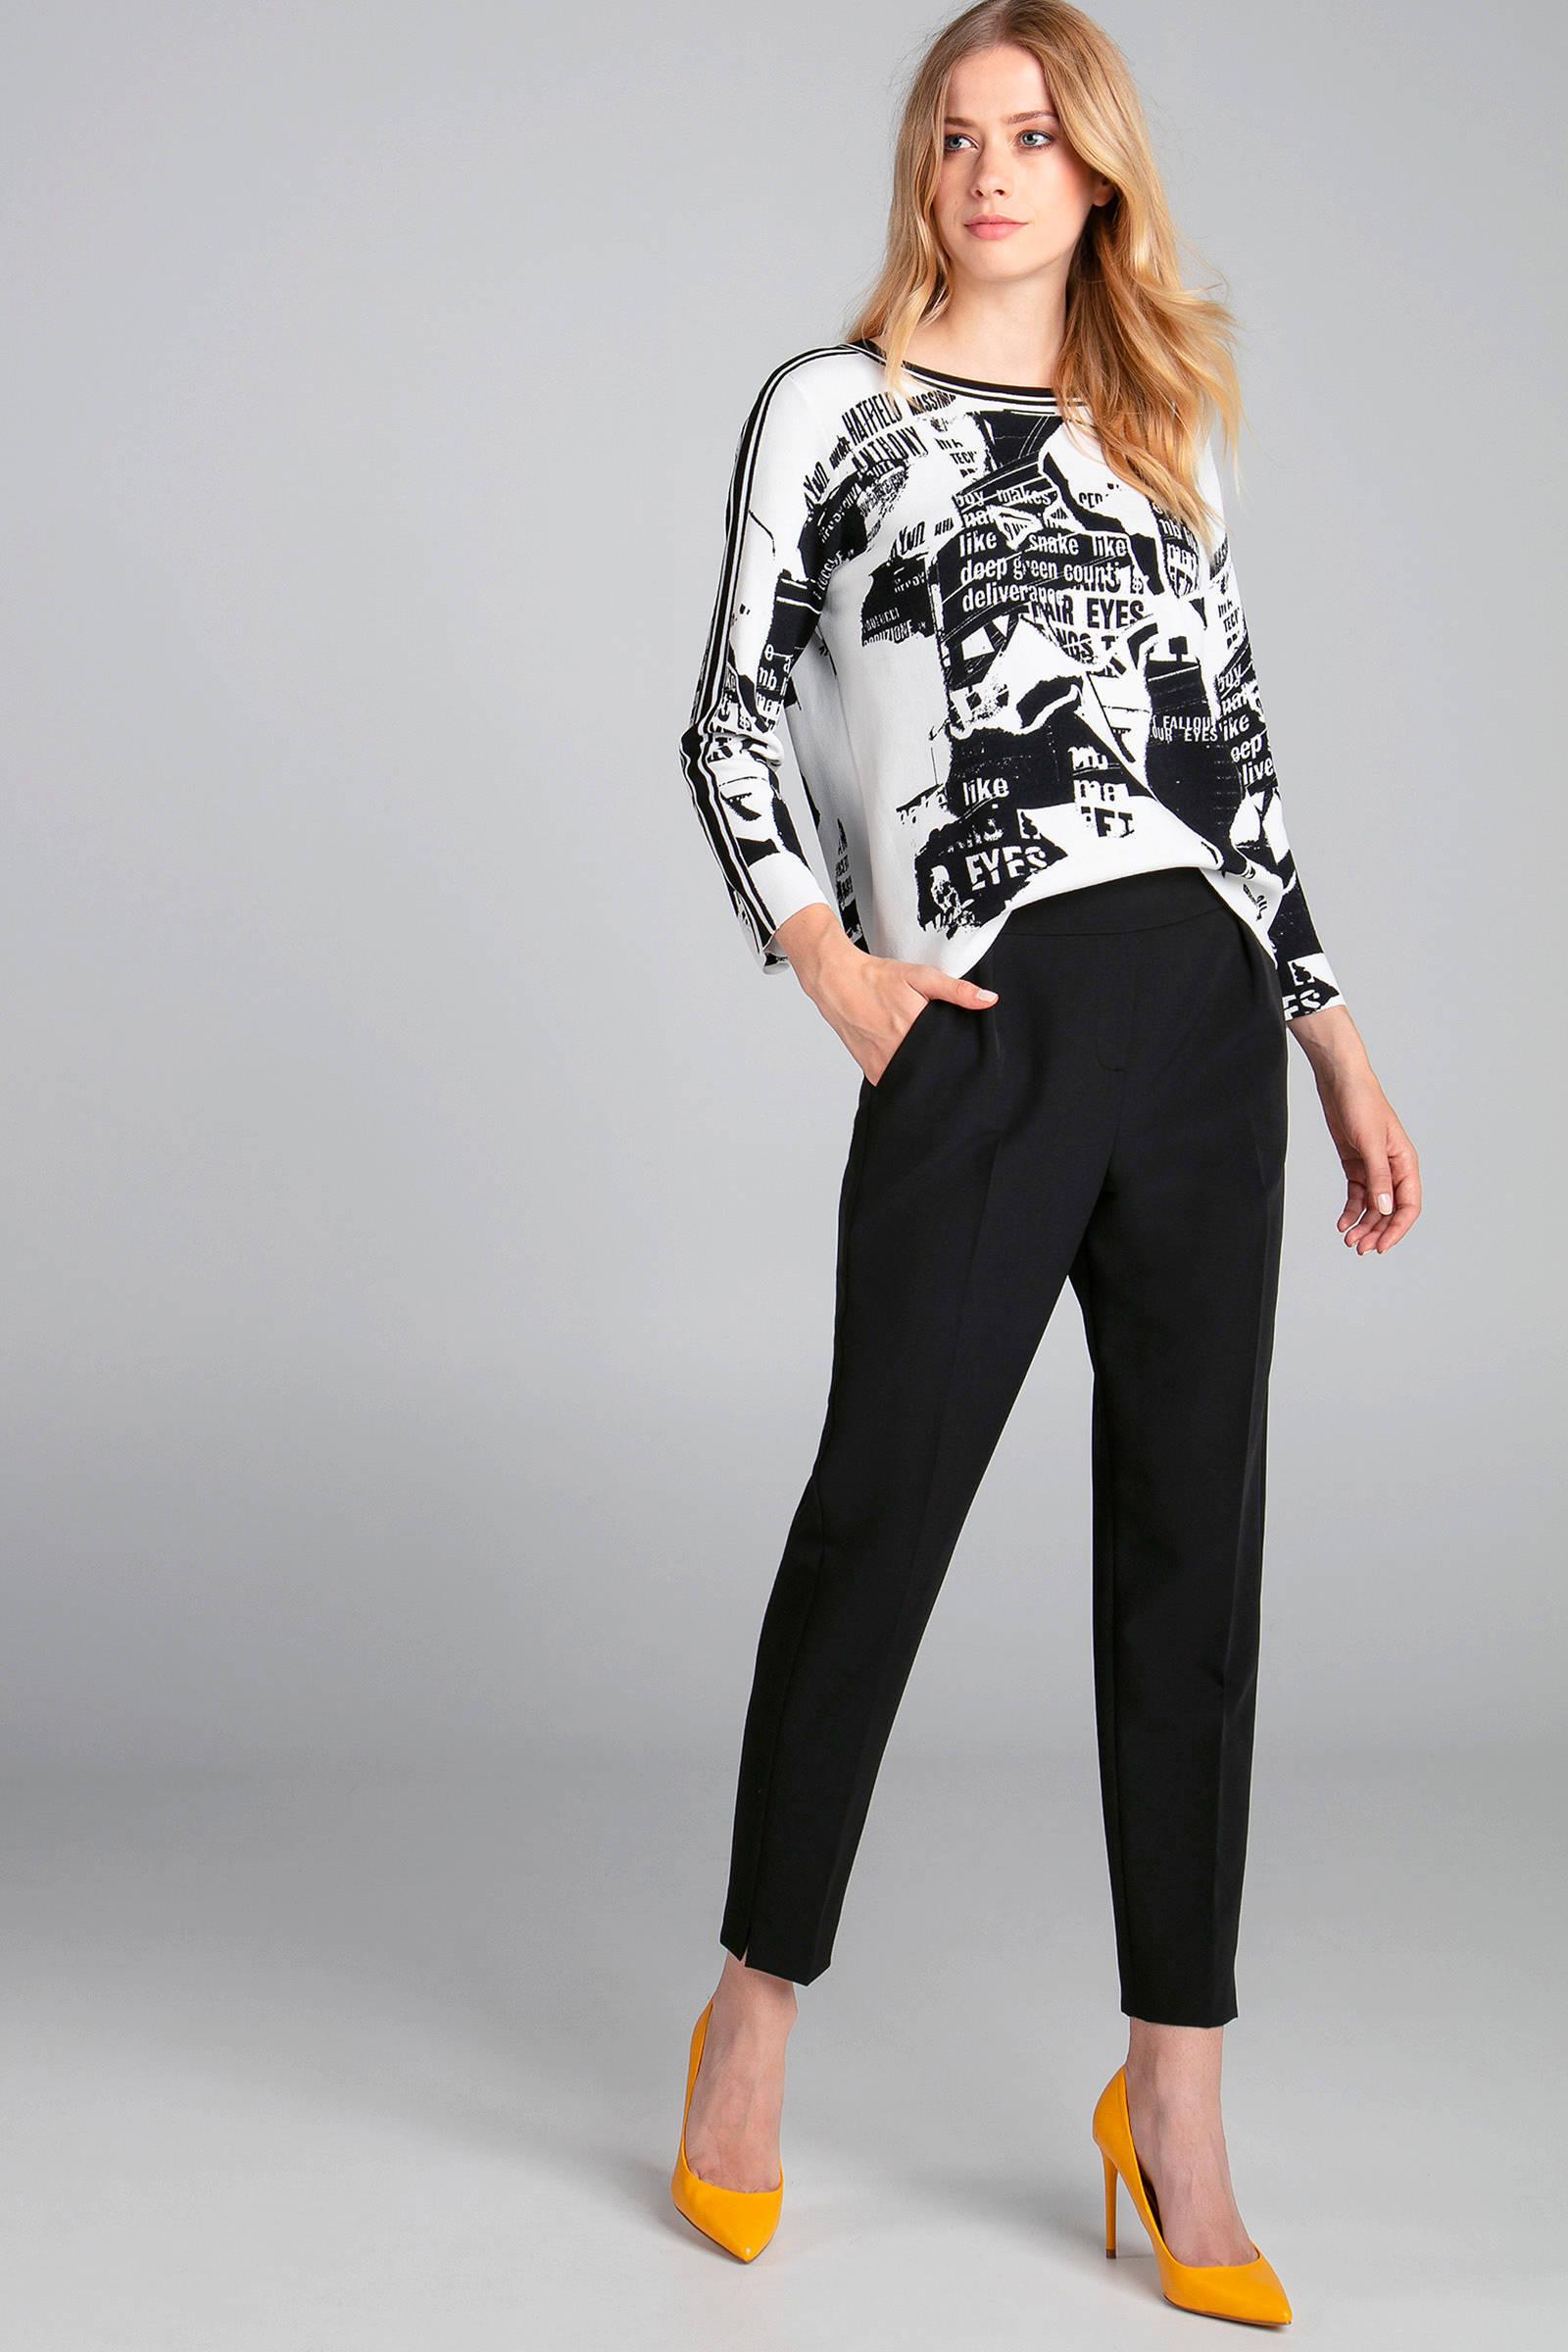 Claudia Sträter trui met allover print zwartwit | wehkamp